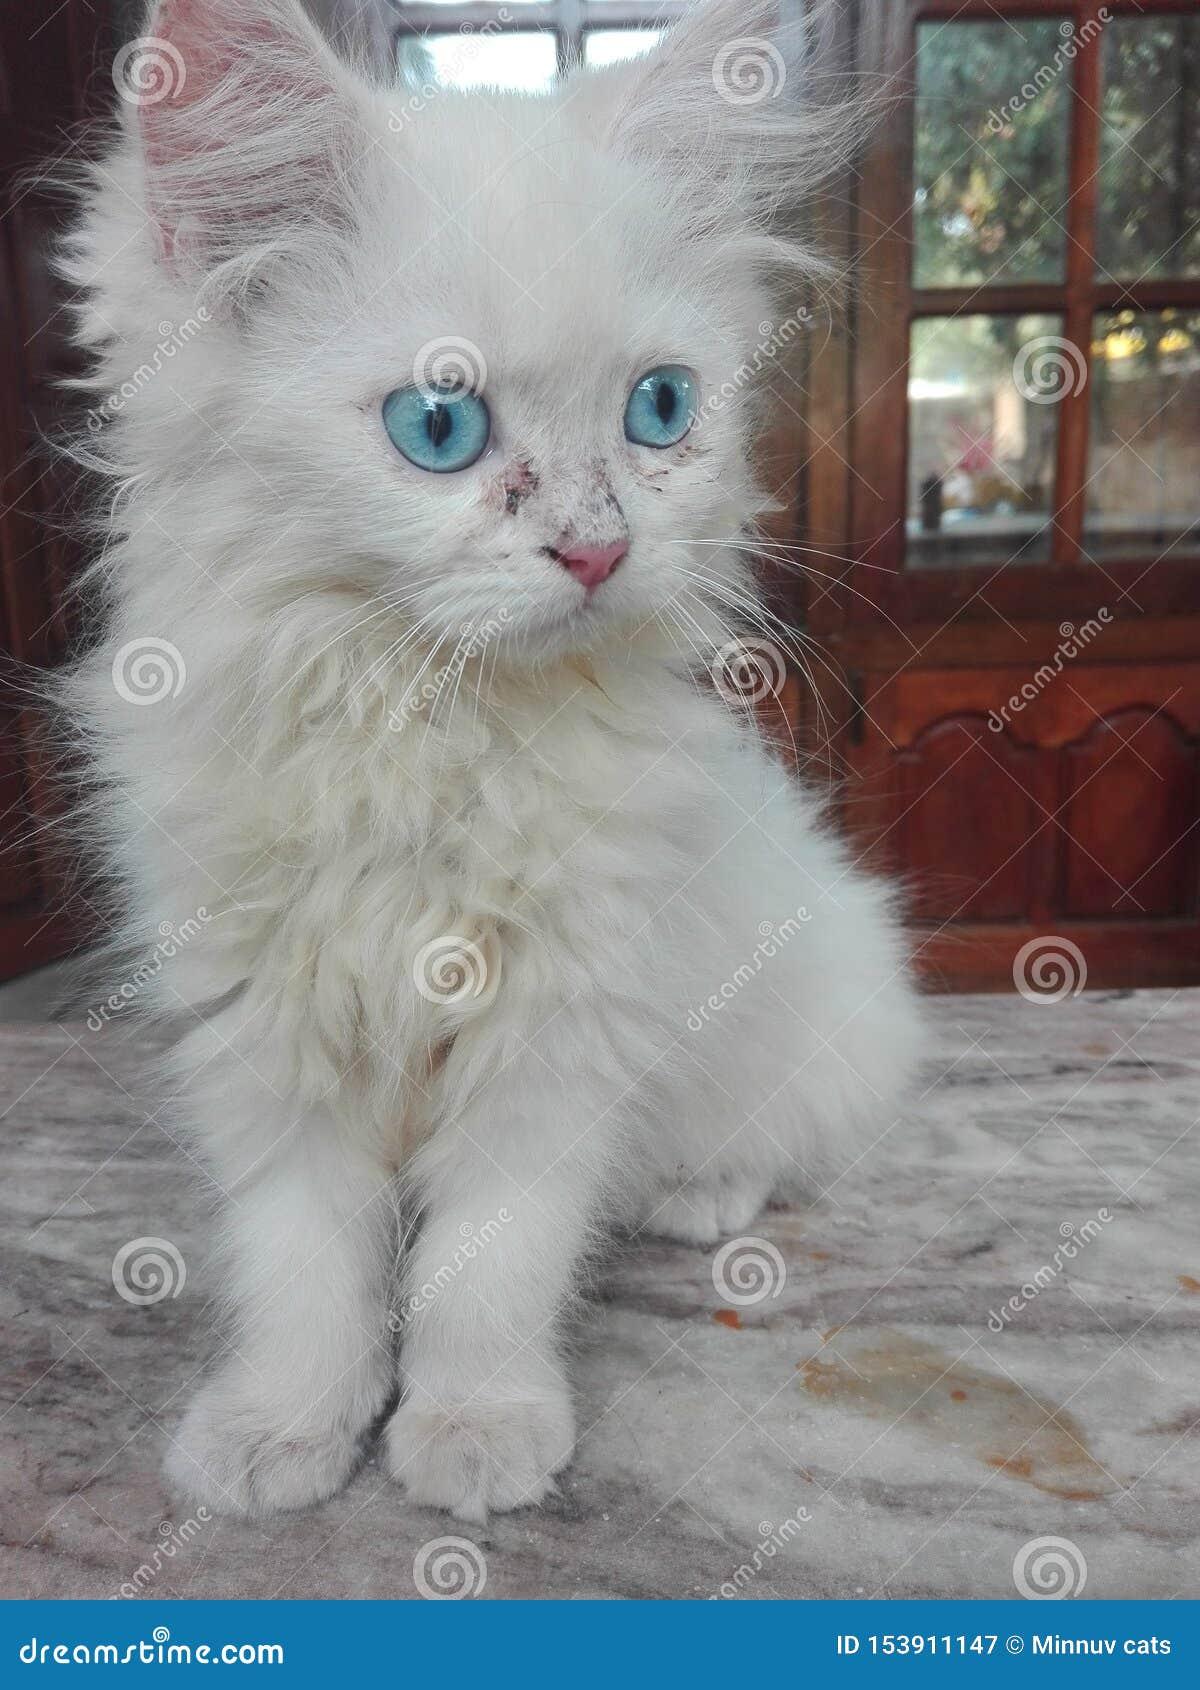 Os amantes do gato podem comprar este